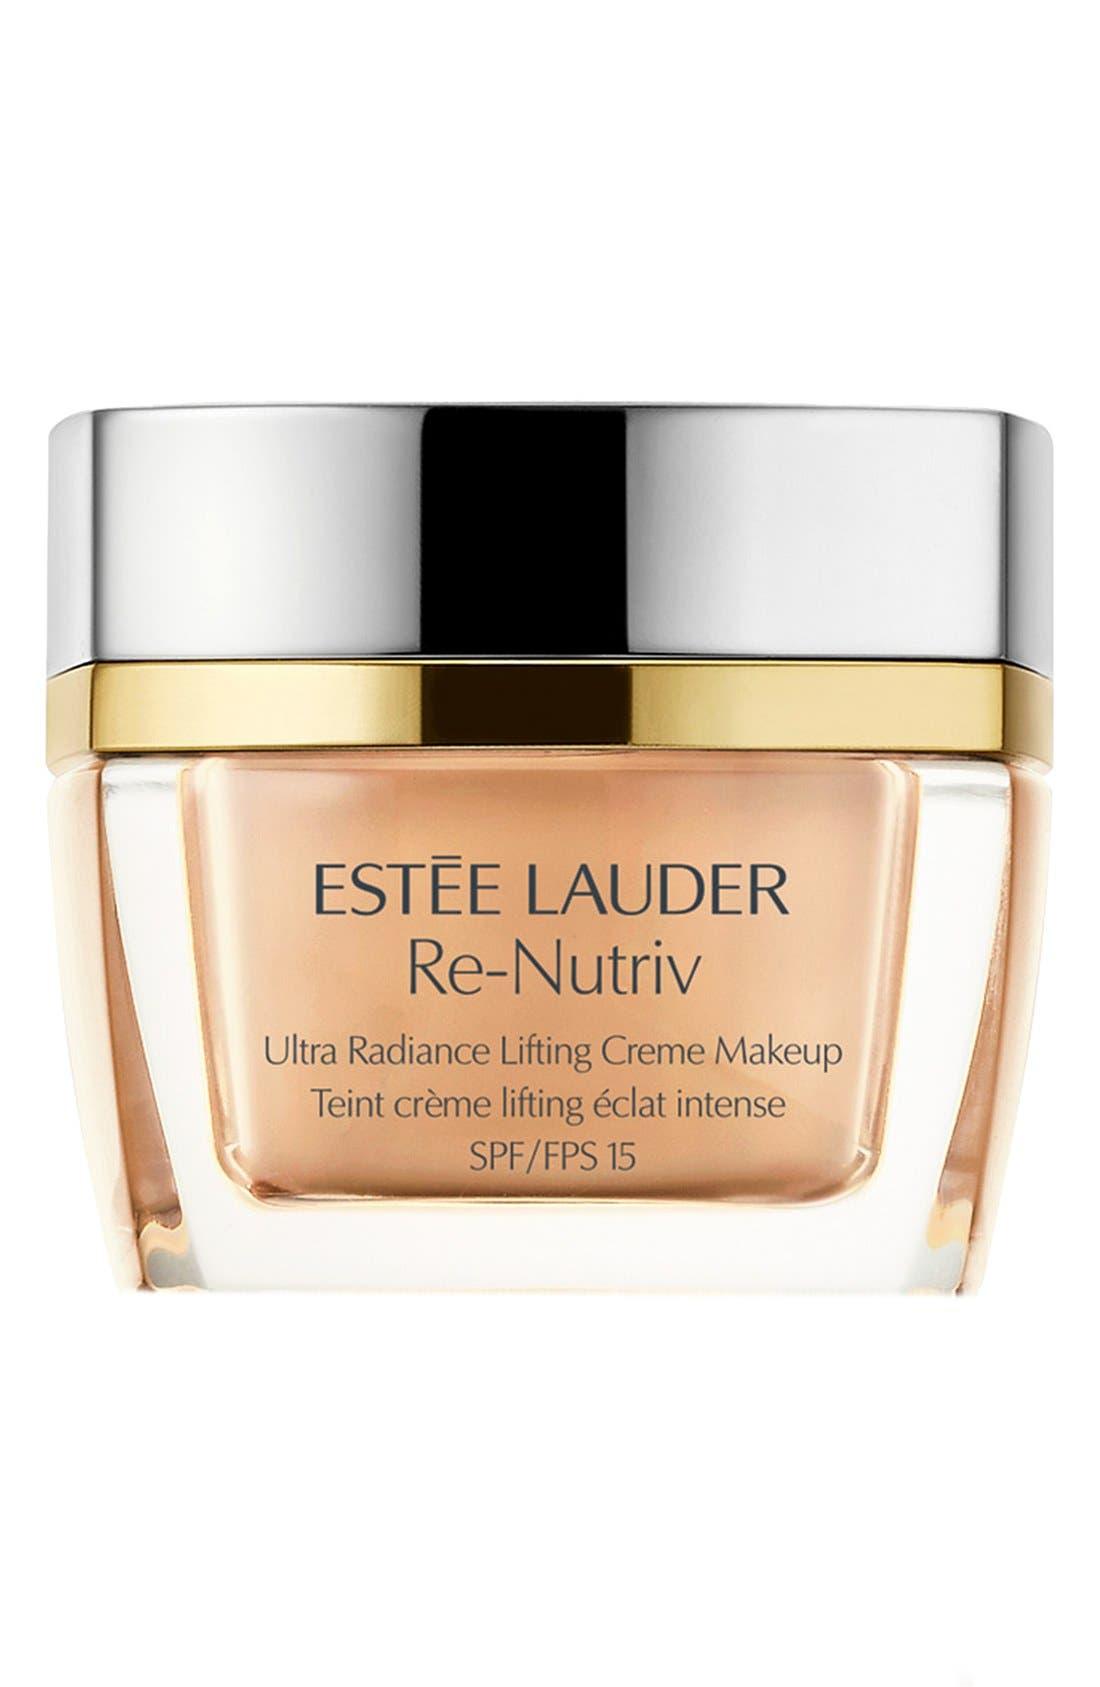 Re-Nutriv Ultra Radiance Lifting Crème Makeup,                             Main thumbnail 1, color,                             COOL BONE 1C1